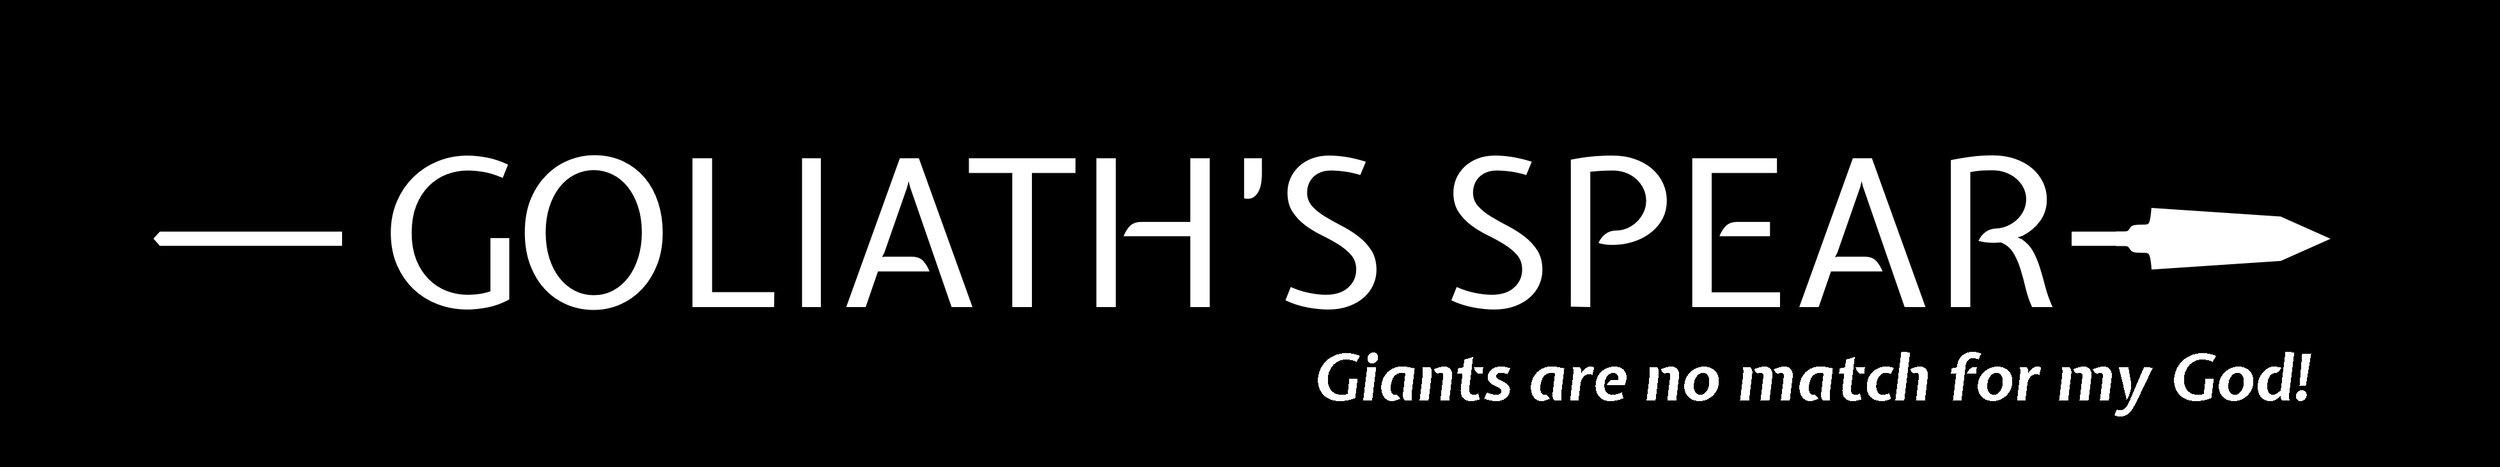 Goliaths_Spear_Black_on_White_Tagline_.jpg